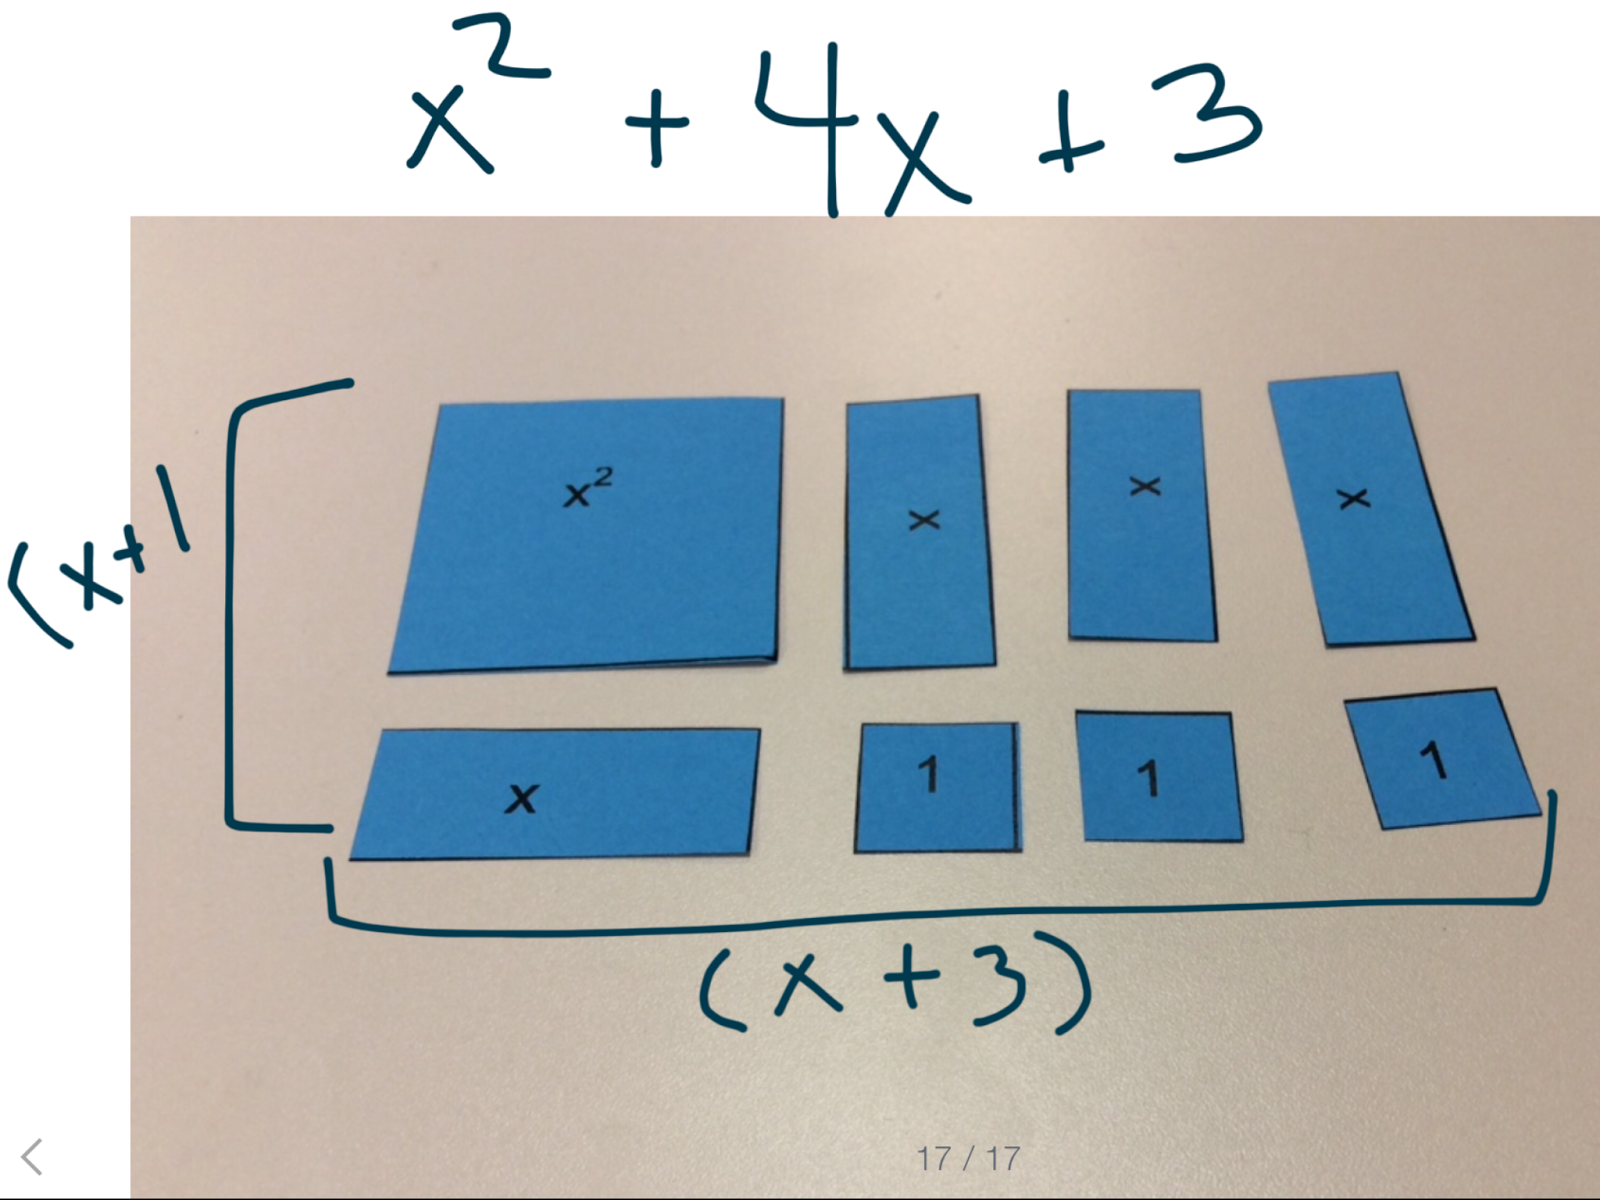 Simplifying Radicals Factoring Trinomials With Algebra Tiles